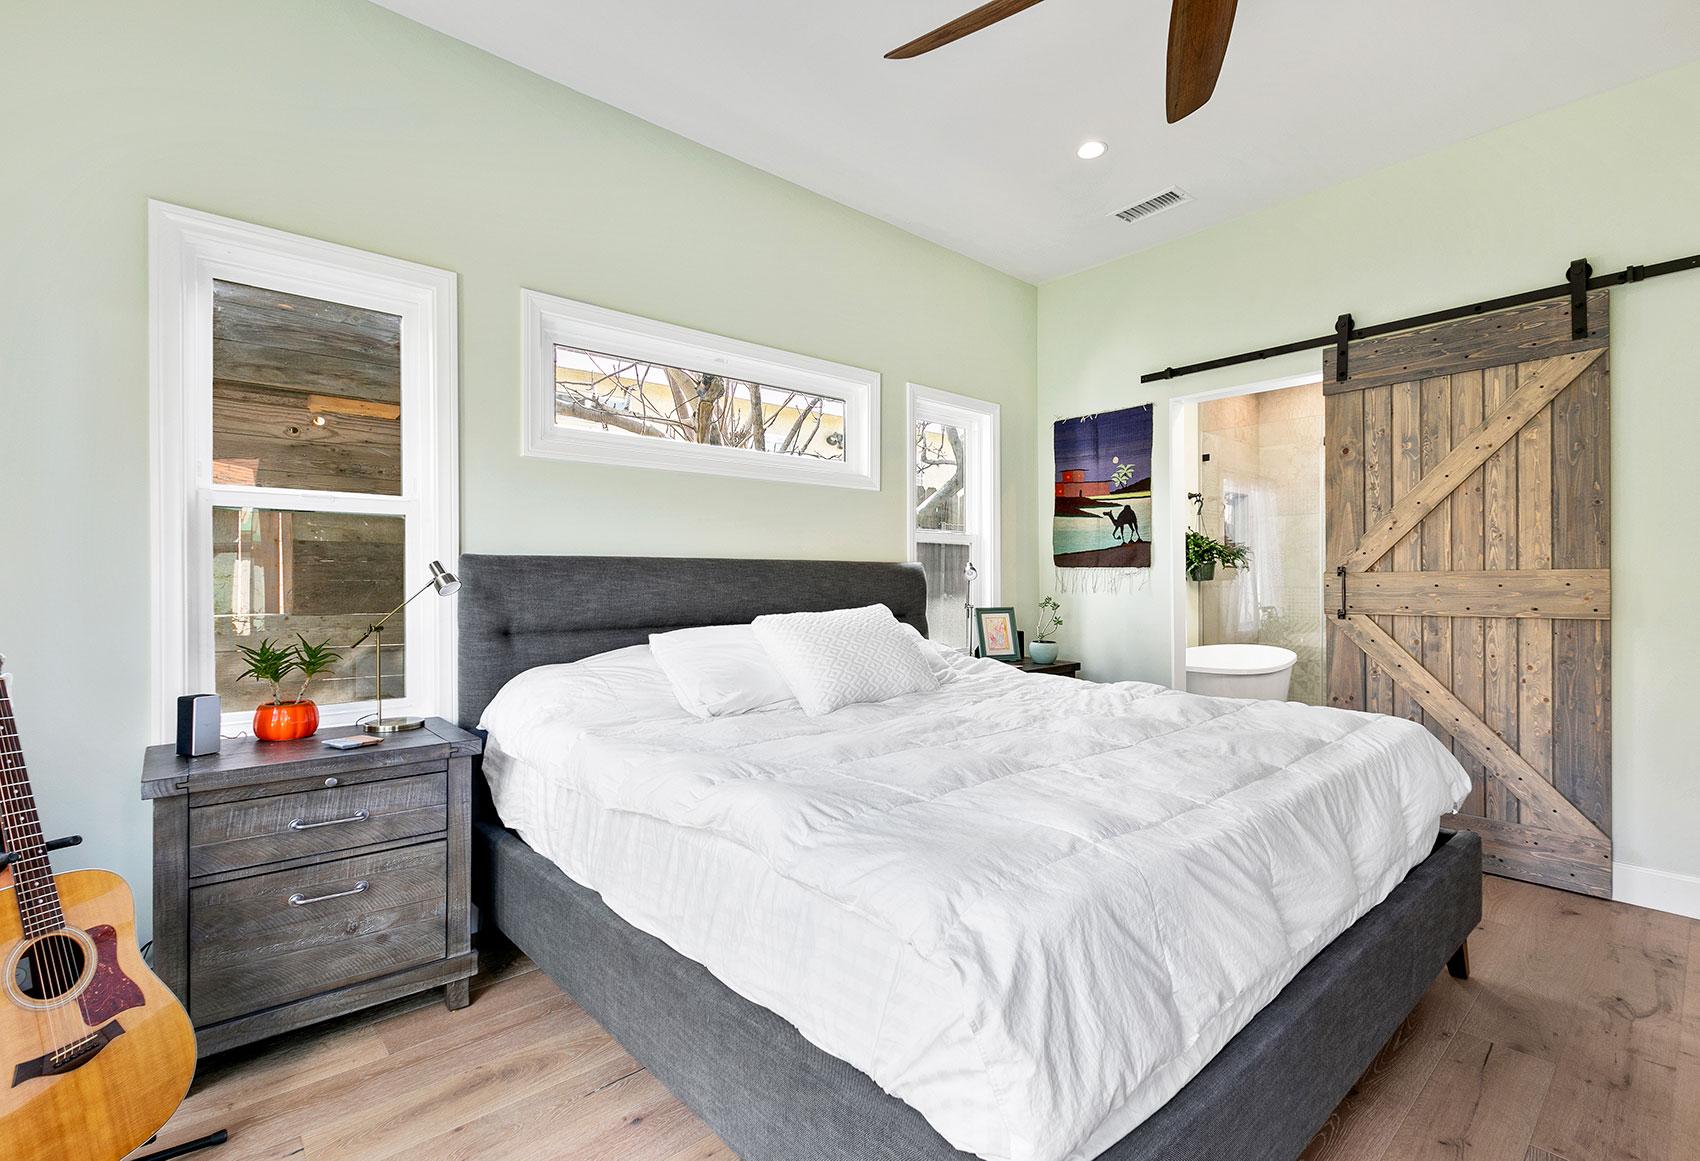 Highland park complete remodel bedroom 7 SMALL.jpg